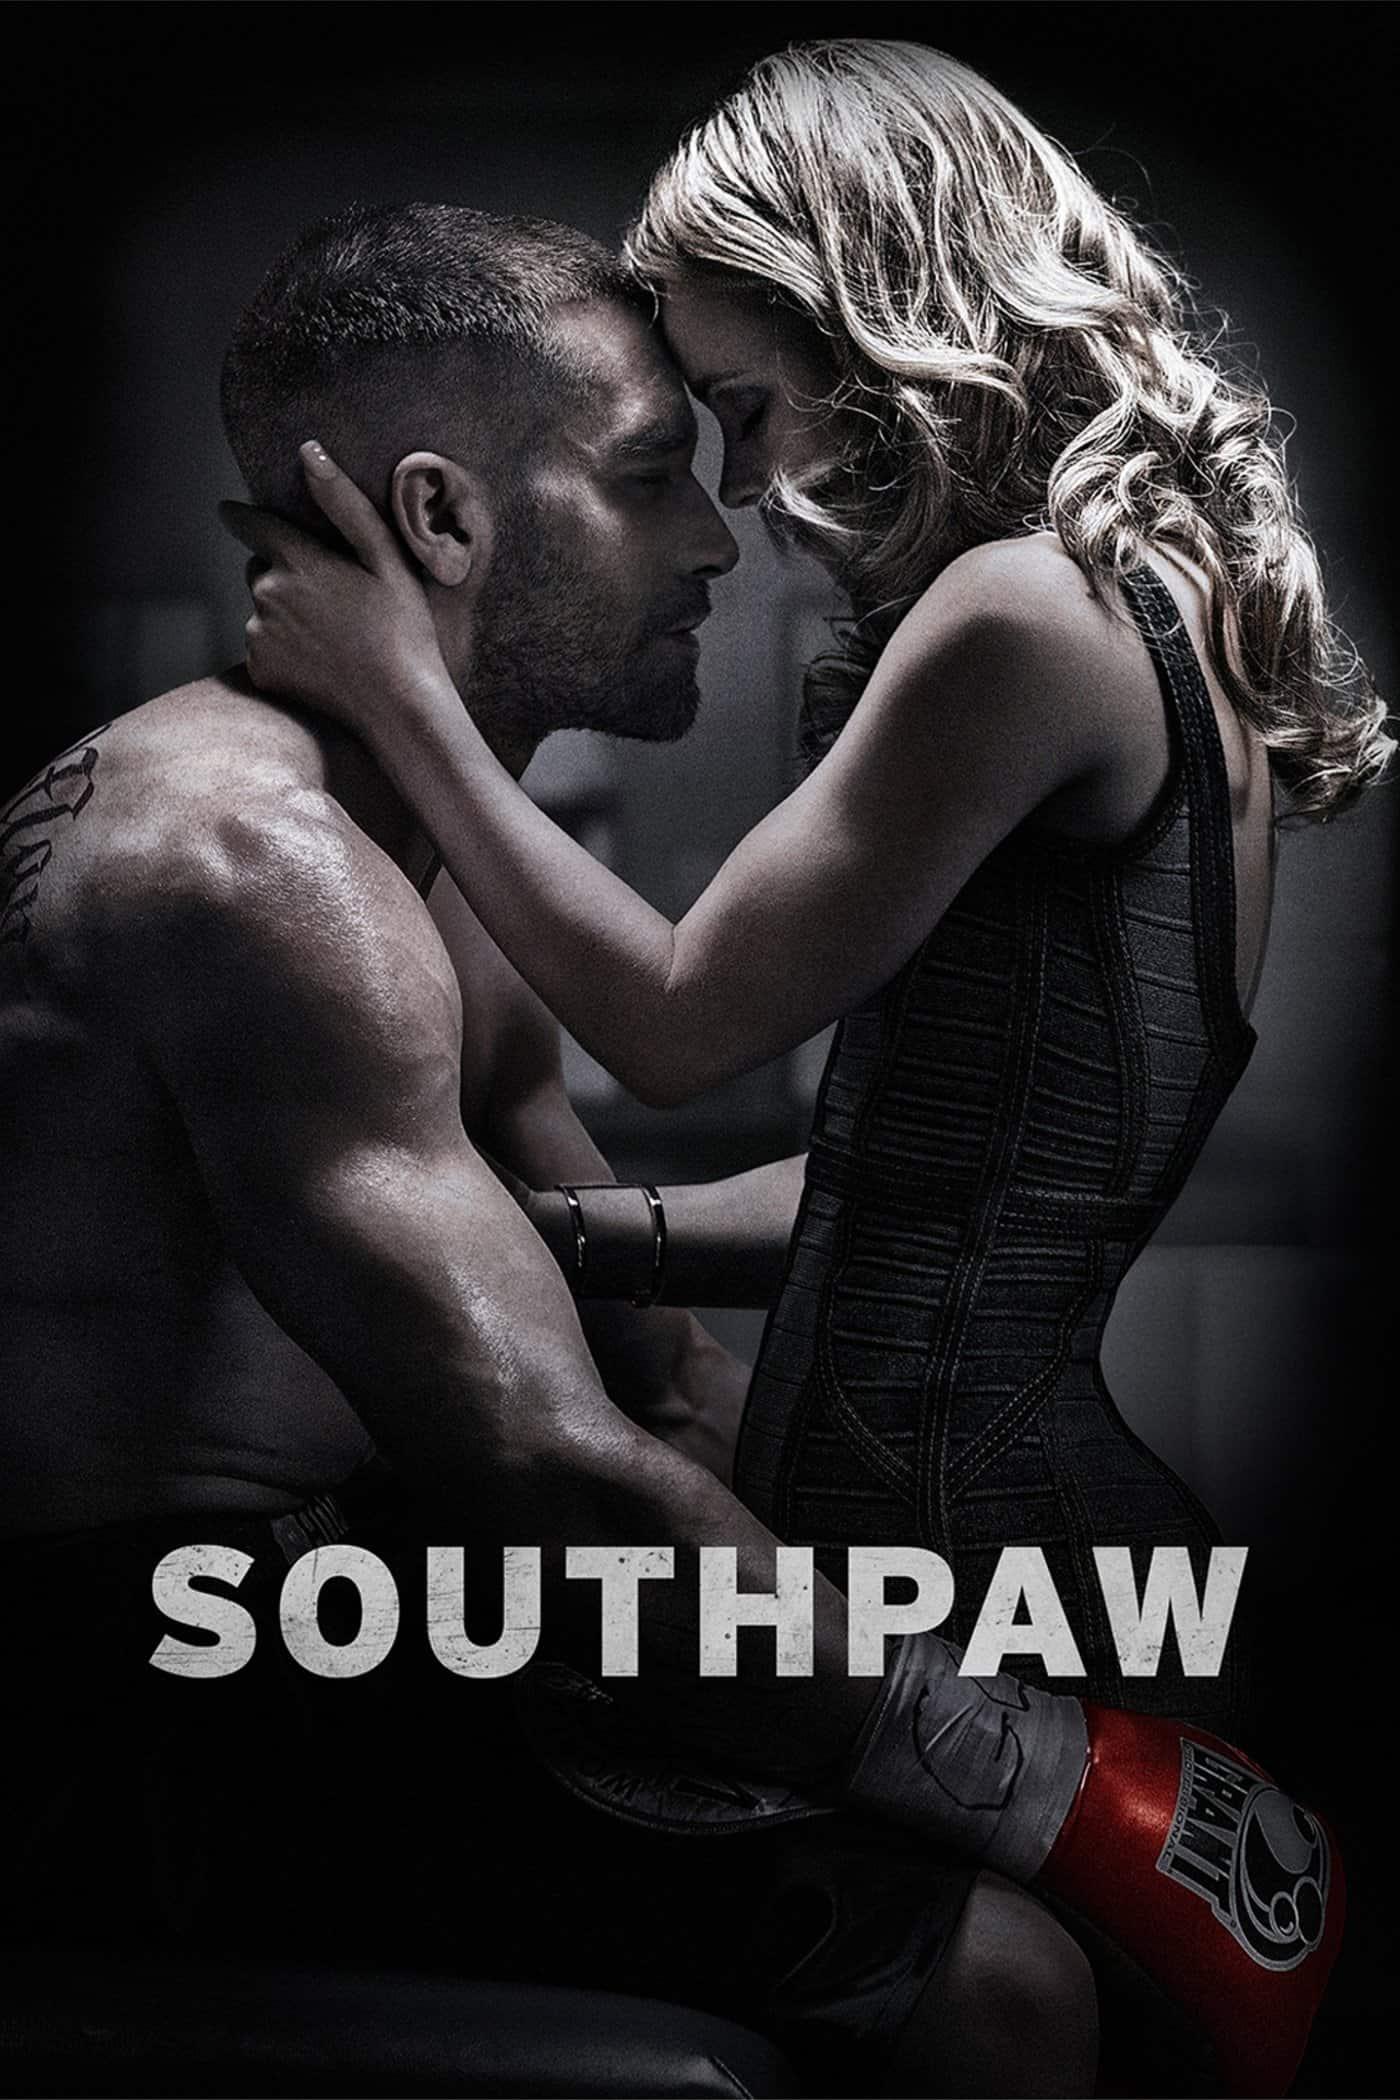 Southpaw, 2015